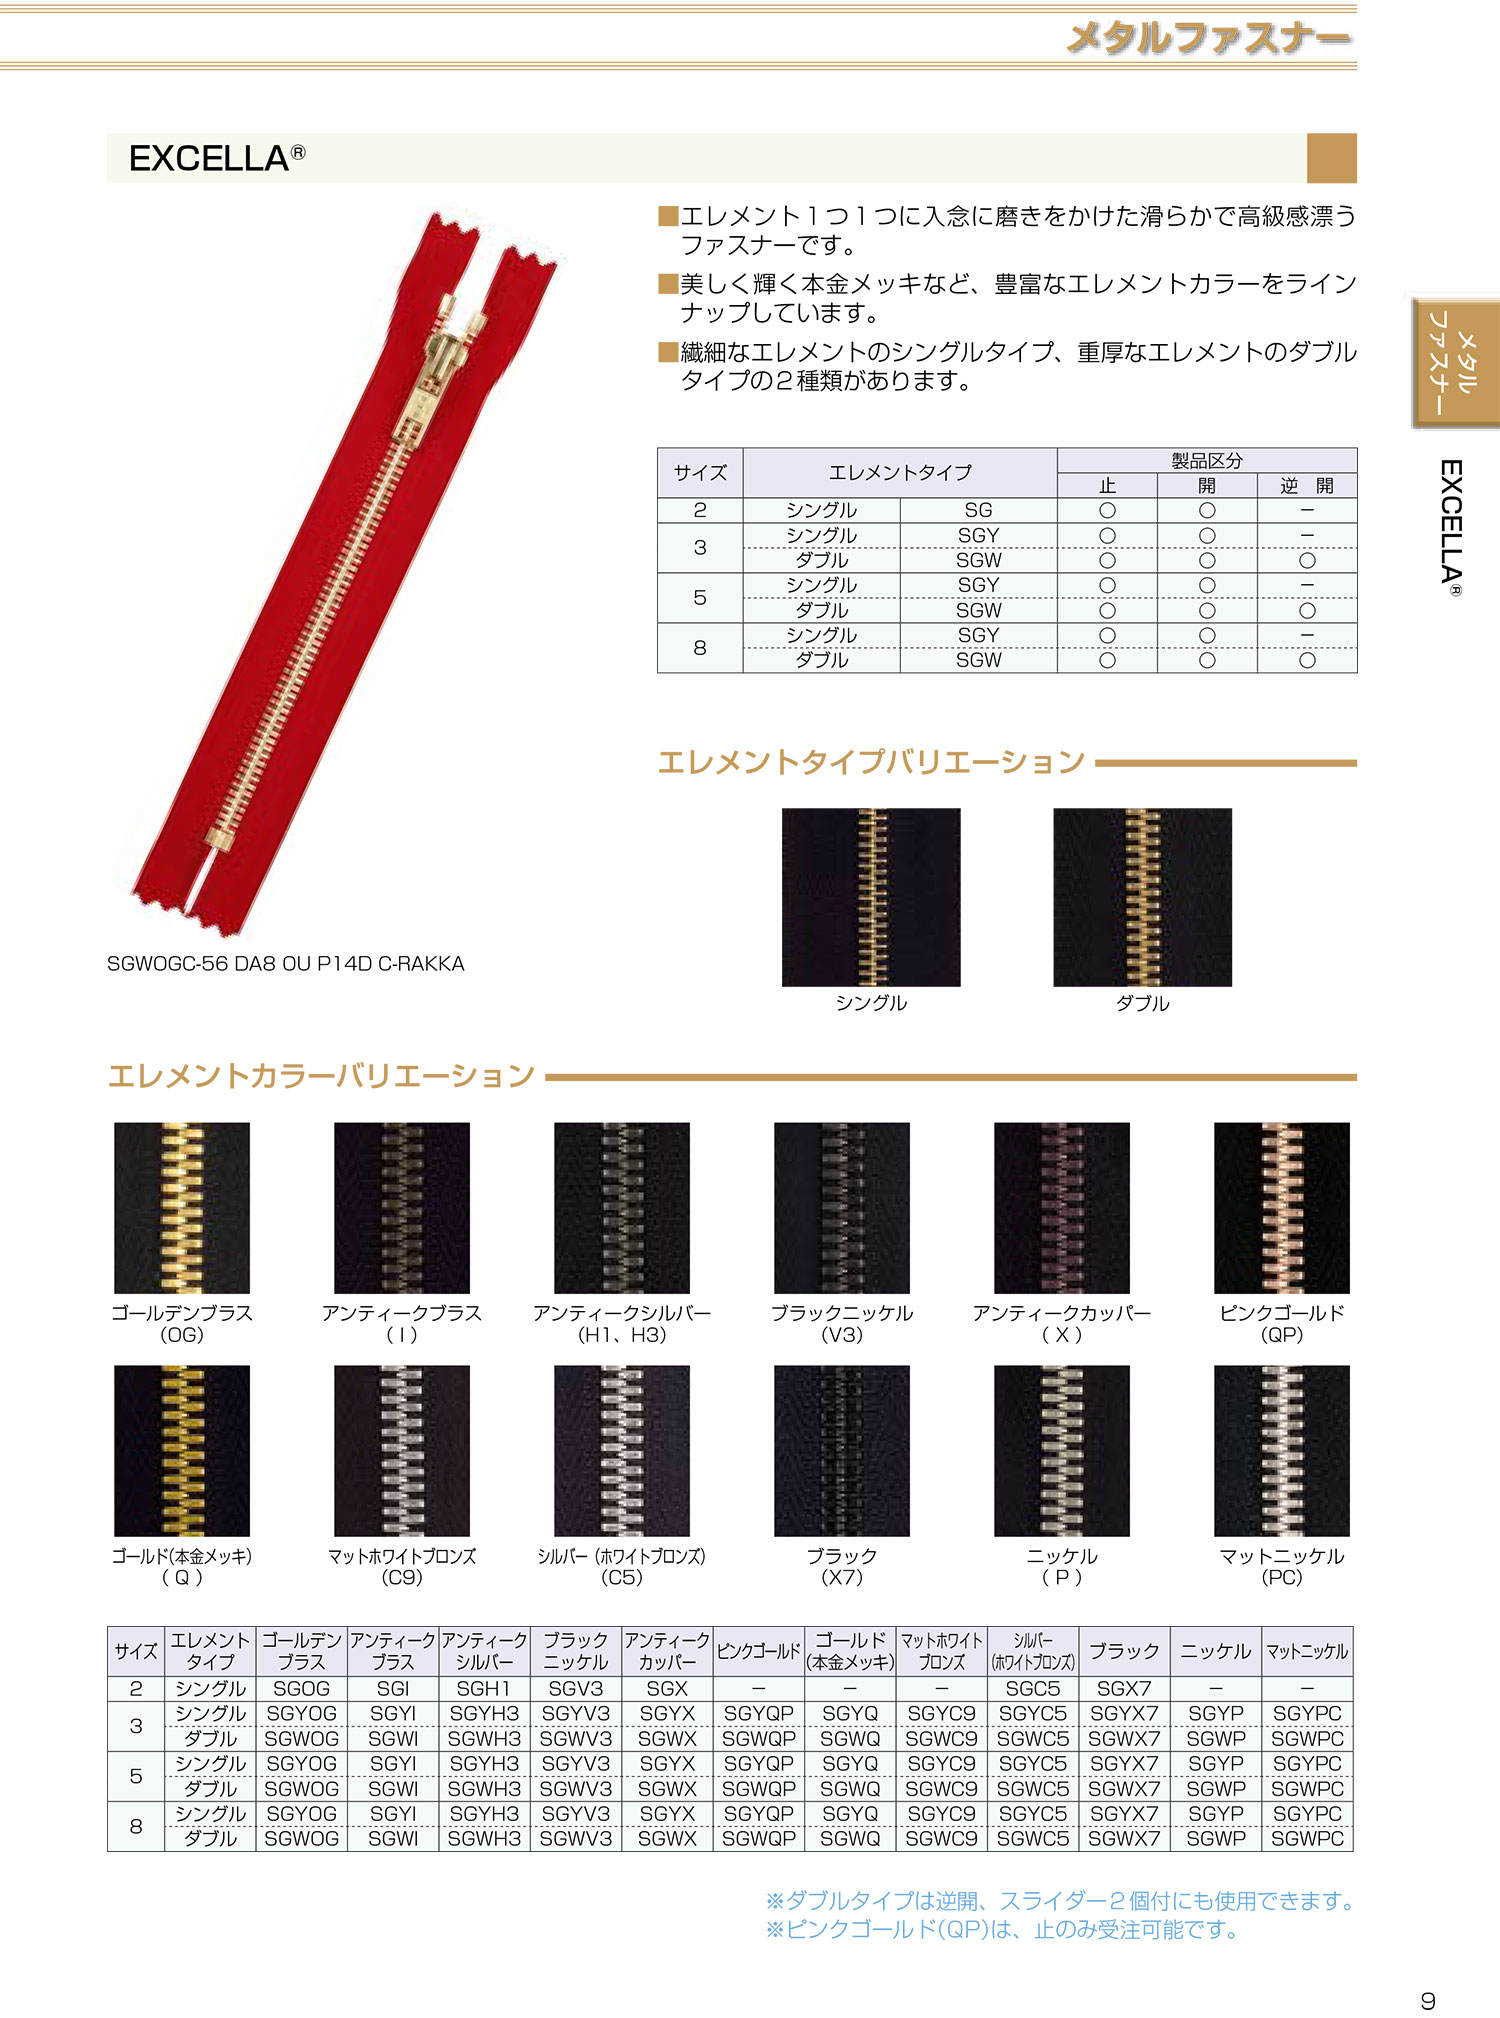 5SGWOGOR エクセラ 5サイズ ゴールデンブラス オープン ダブル[ファスナー] YKK/オークラ商事 - ApparelX アパレル資材卸通販